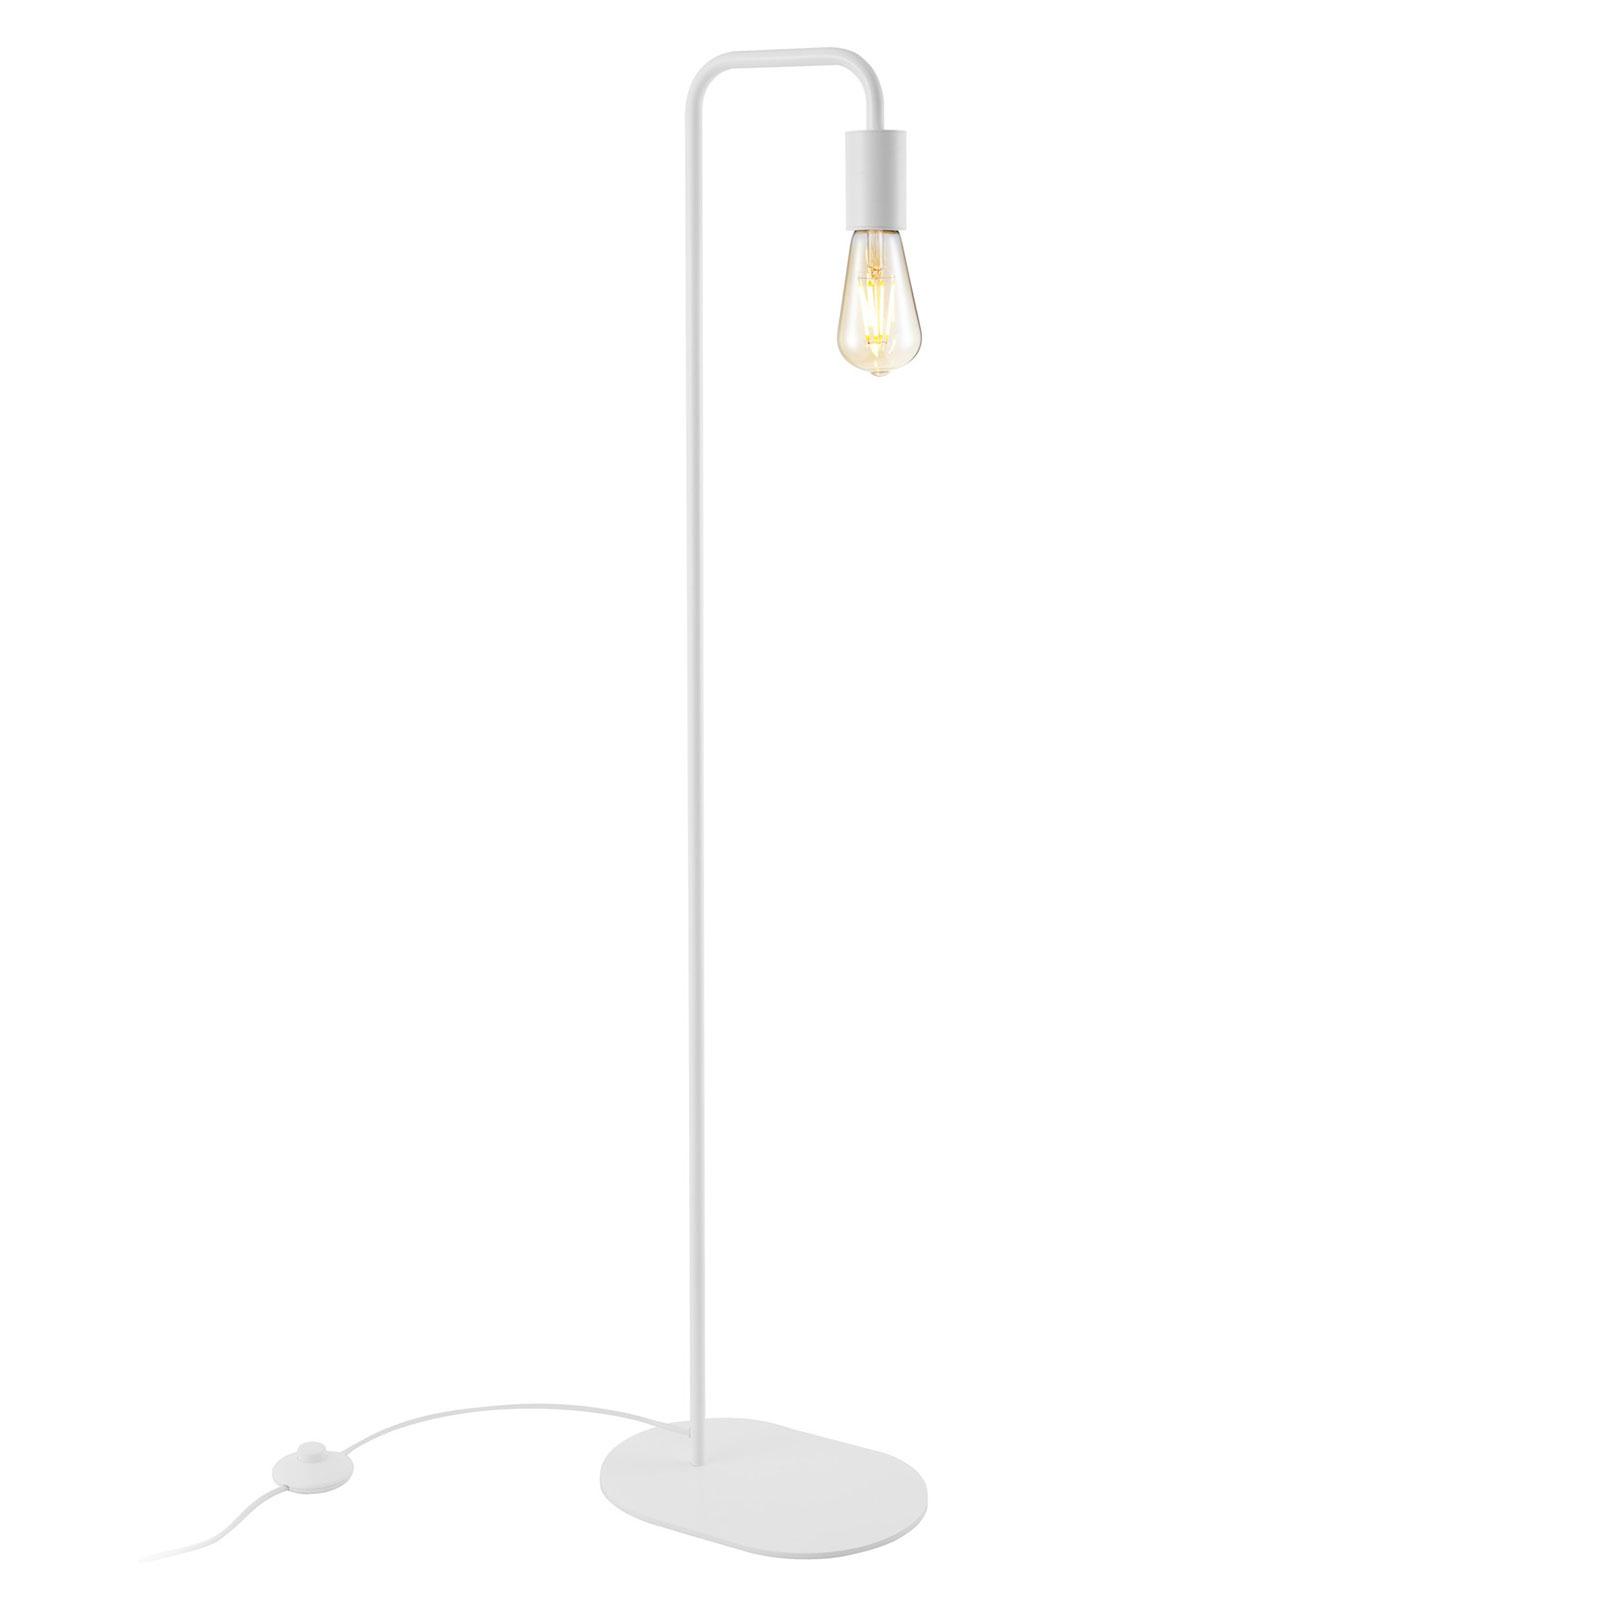 SLV Fitu gulvlampe i metal, hvid